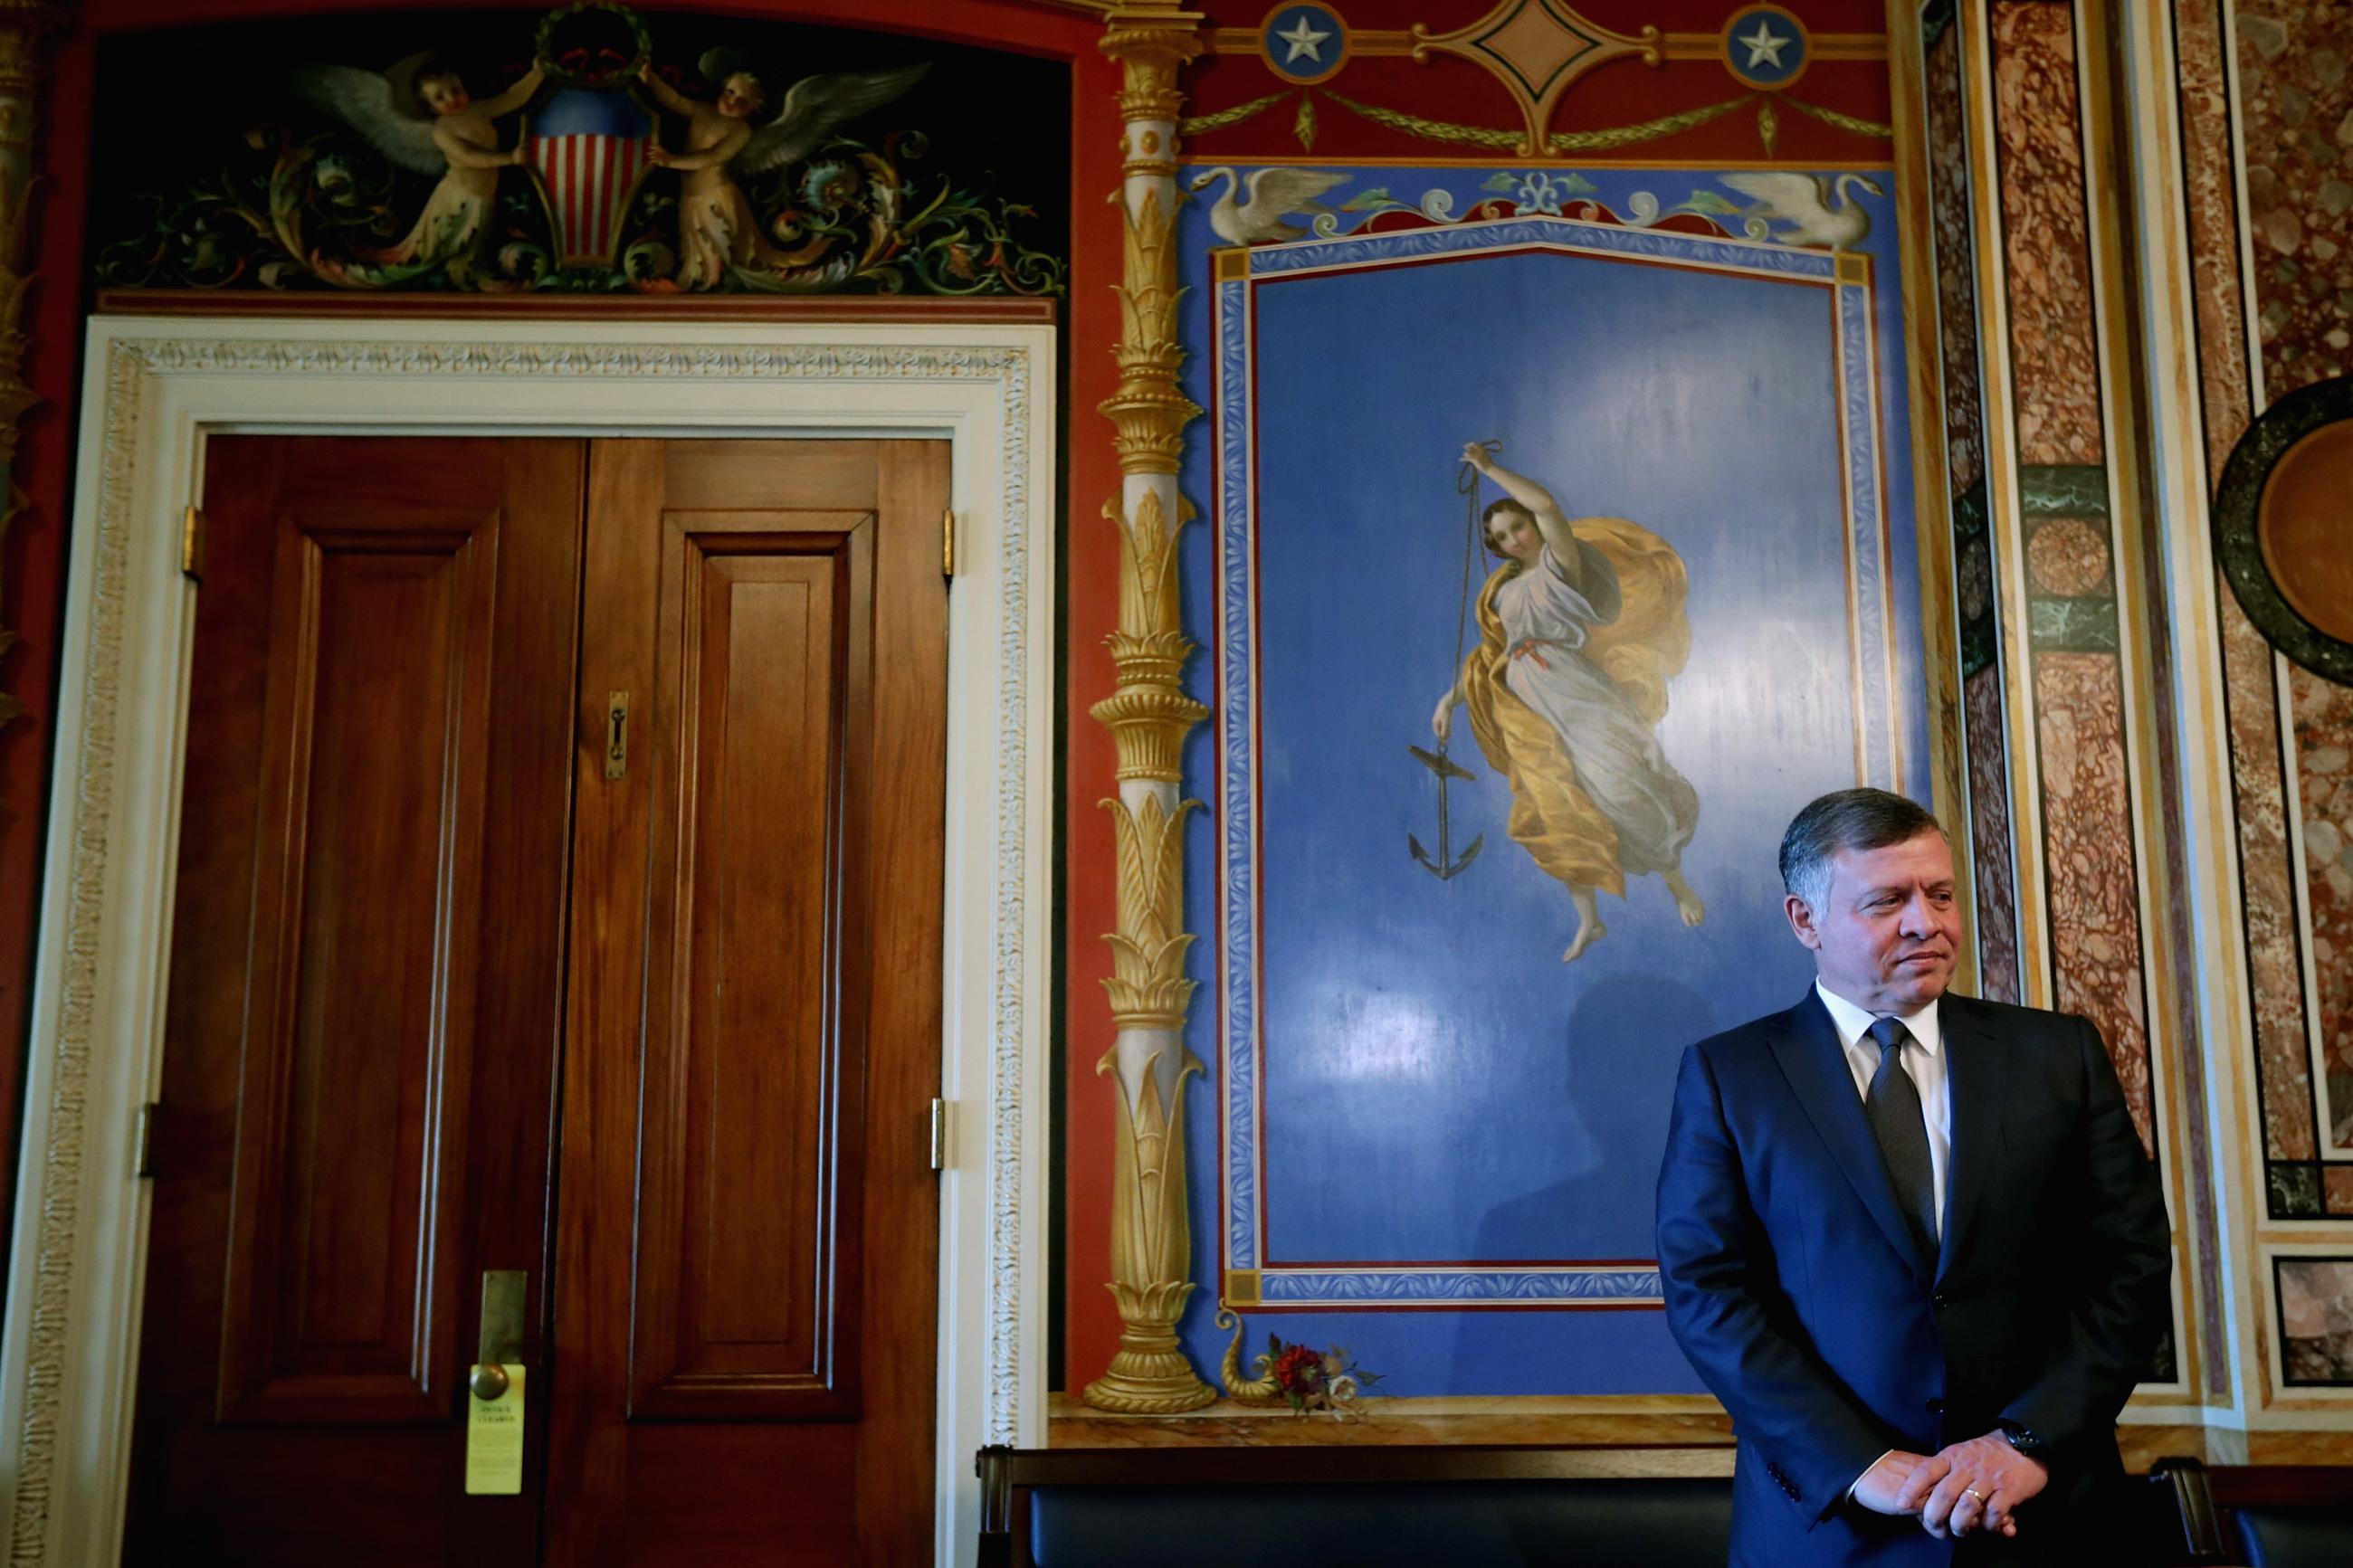 Jordan's Retaliation Is the Real Arab Awakening the Pentagon Has Been Waiting For